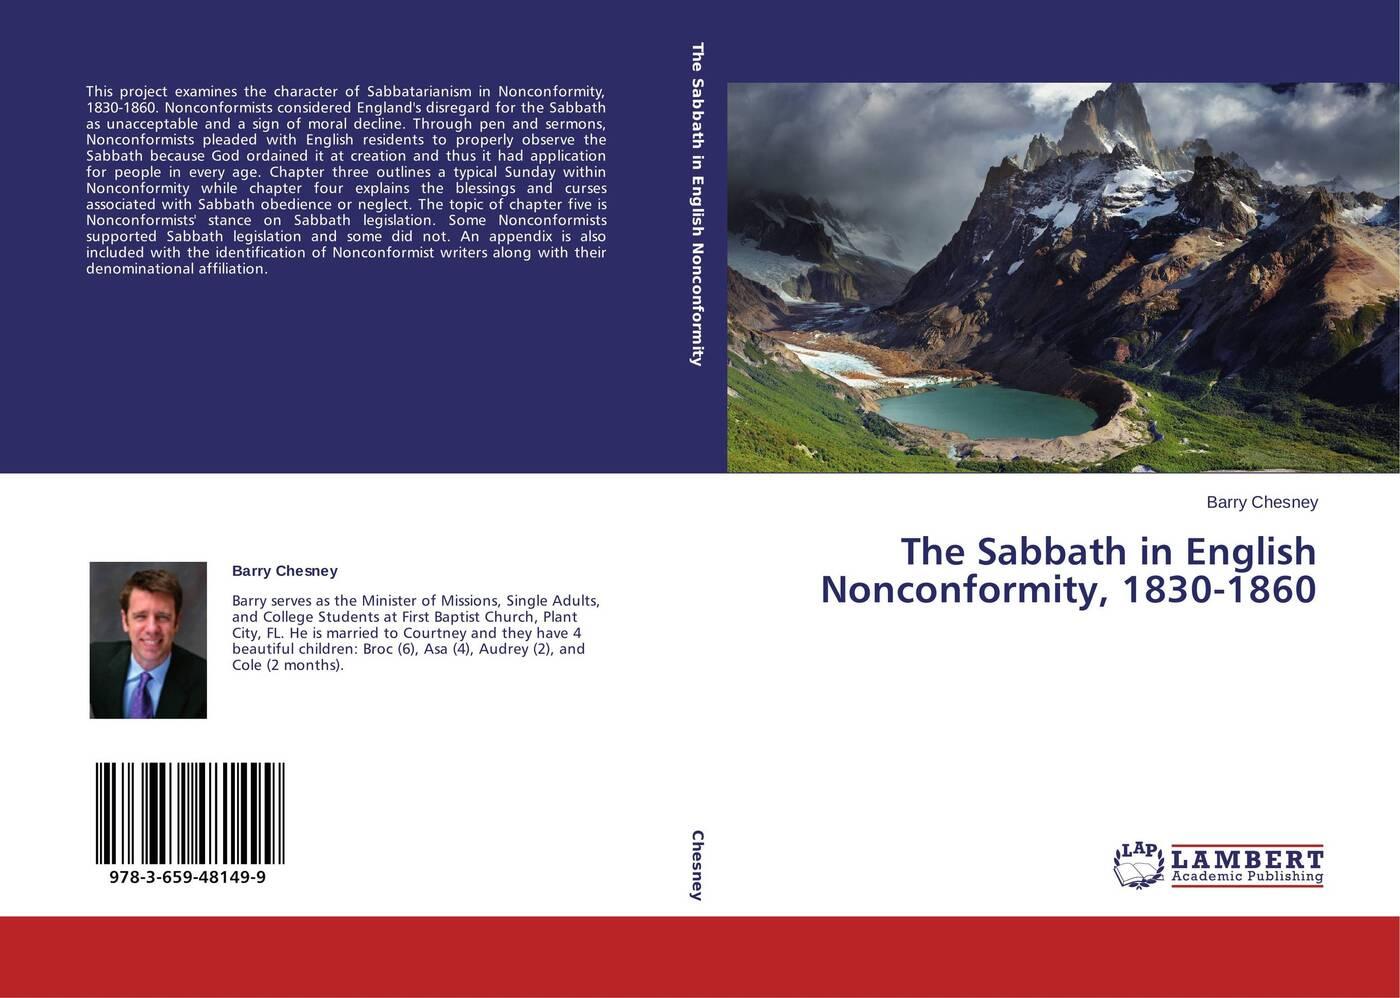 Barry Chesney The Sabbath in English Nonconformity, 1830-1860 andrews silas milton the sabbath at home